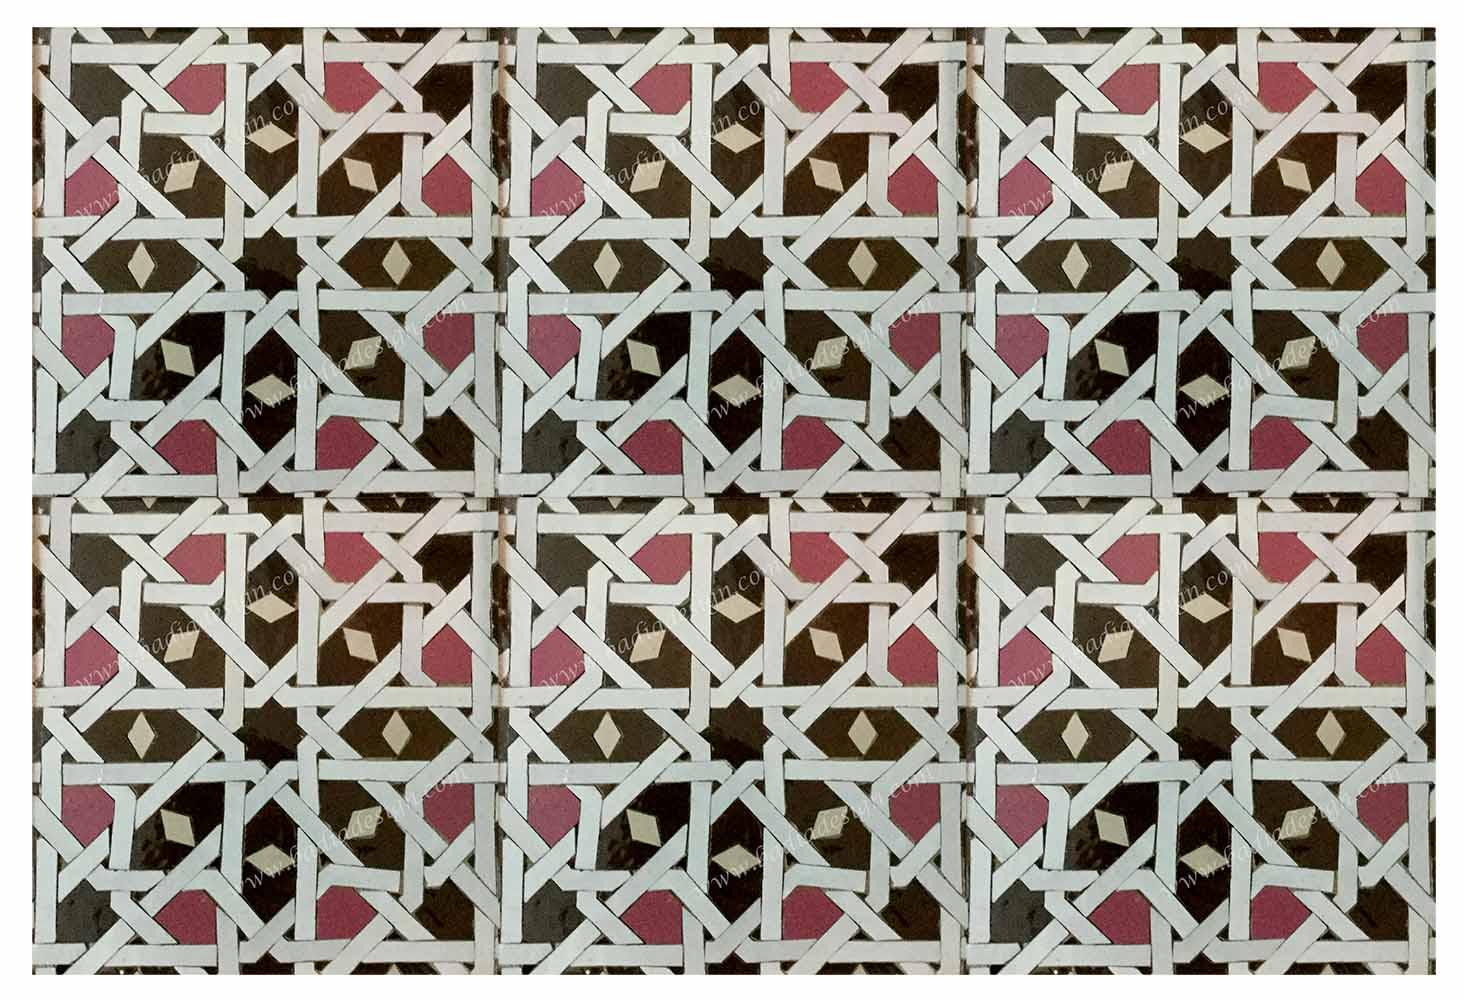 Moroccan Mosaic Floor Tile